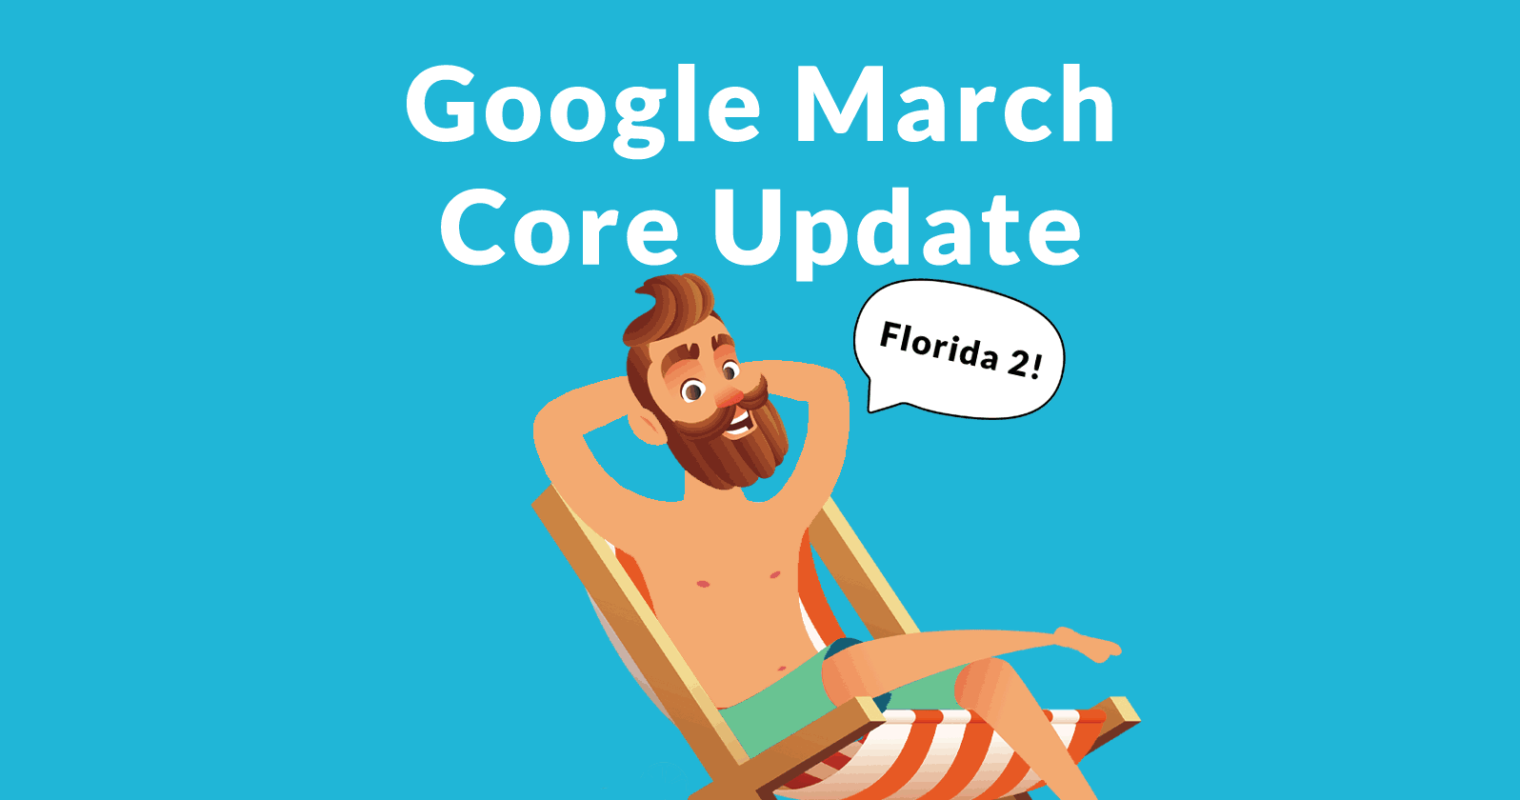 Google Update Florida 2: March 2019 Core Update Is a Big One